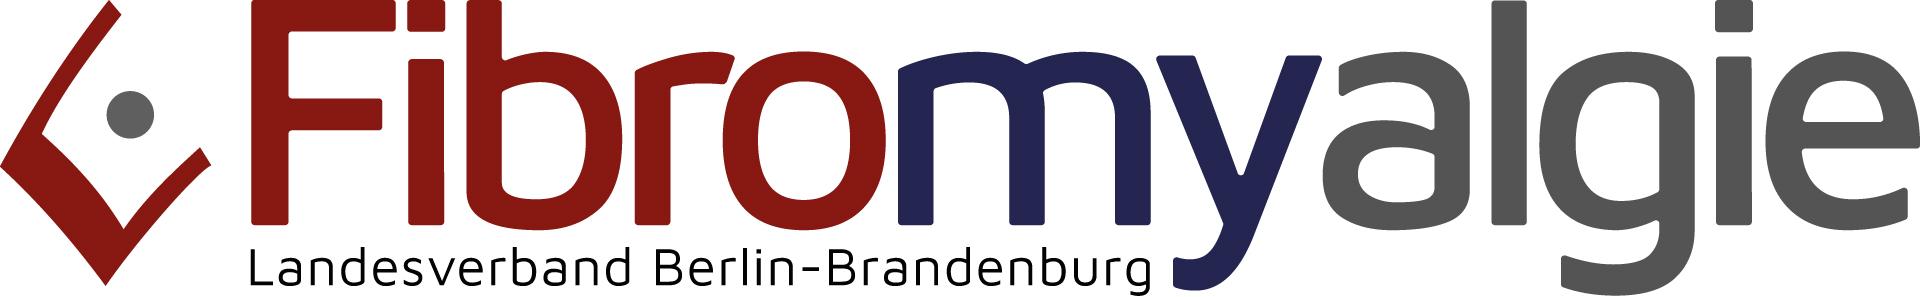 Fibromyalgie Landesverband Berlin-Brandenburg